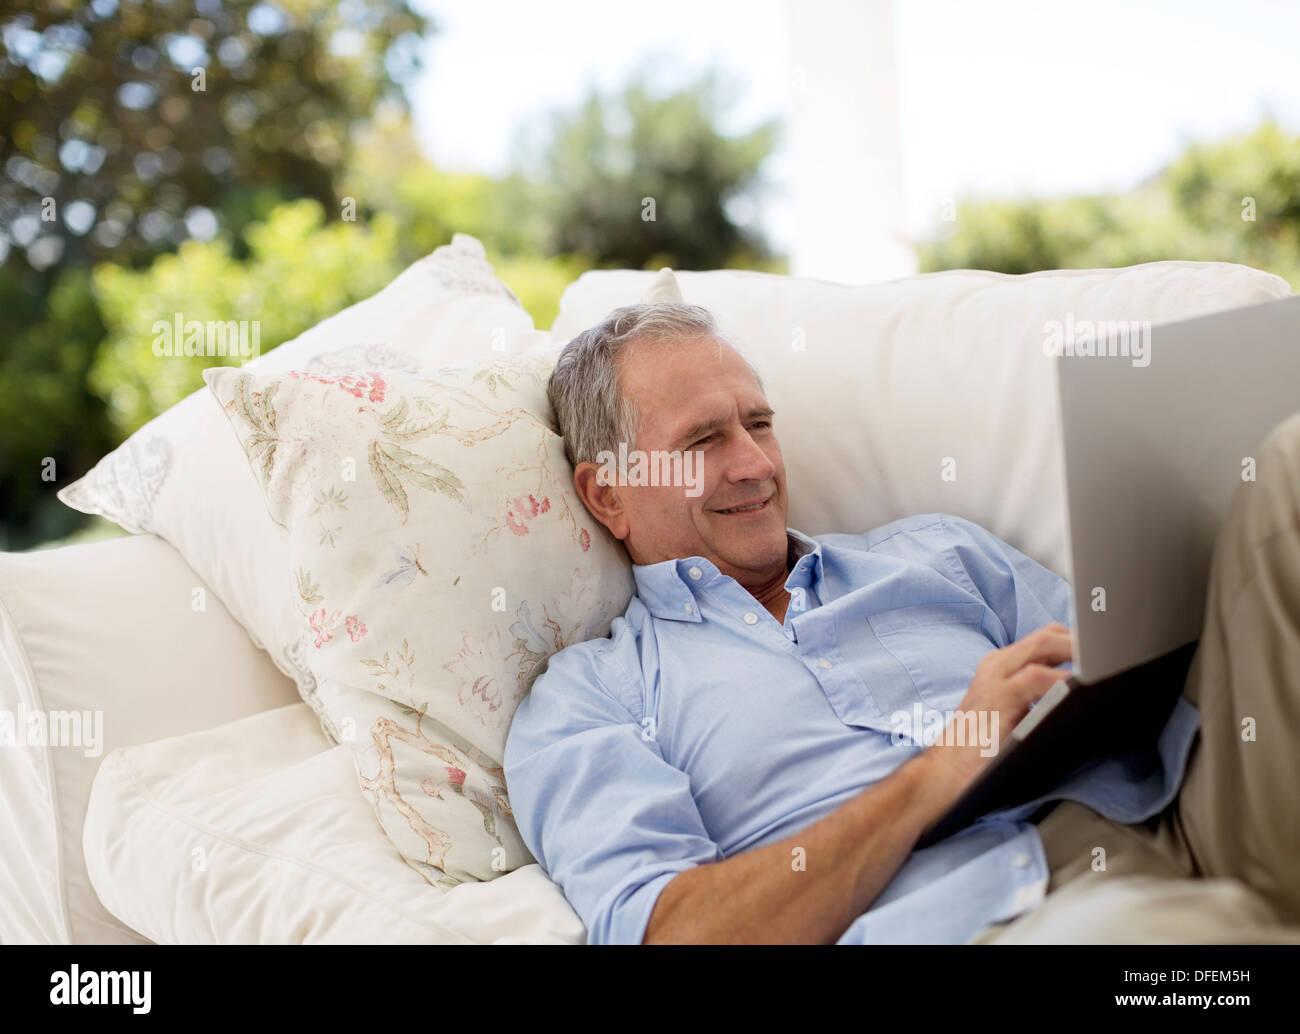 Senior man using laptop on patio sofa - Stock Image